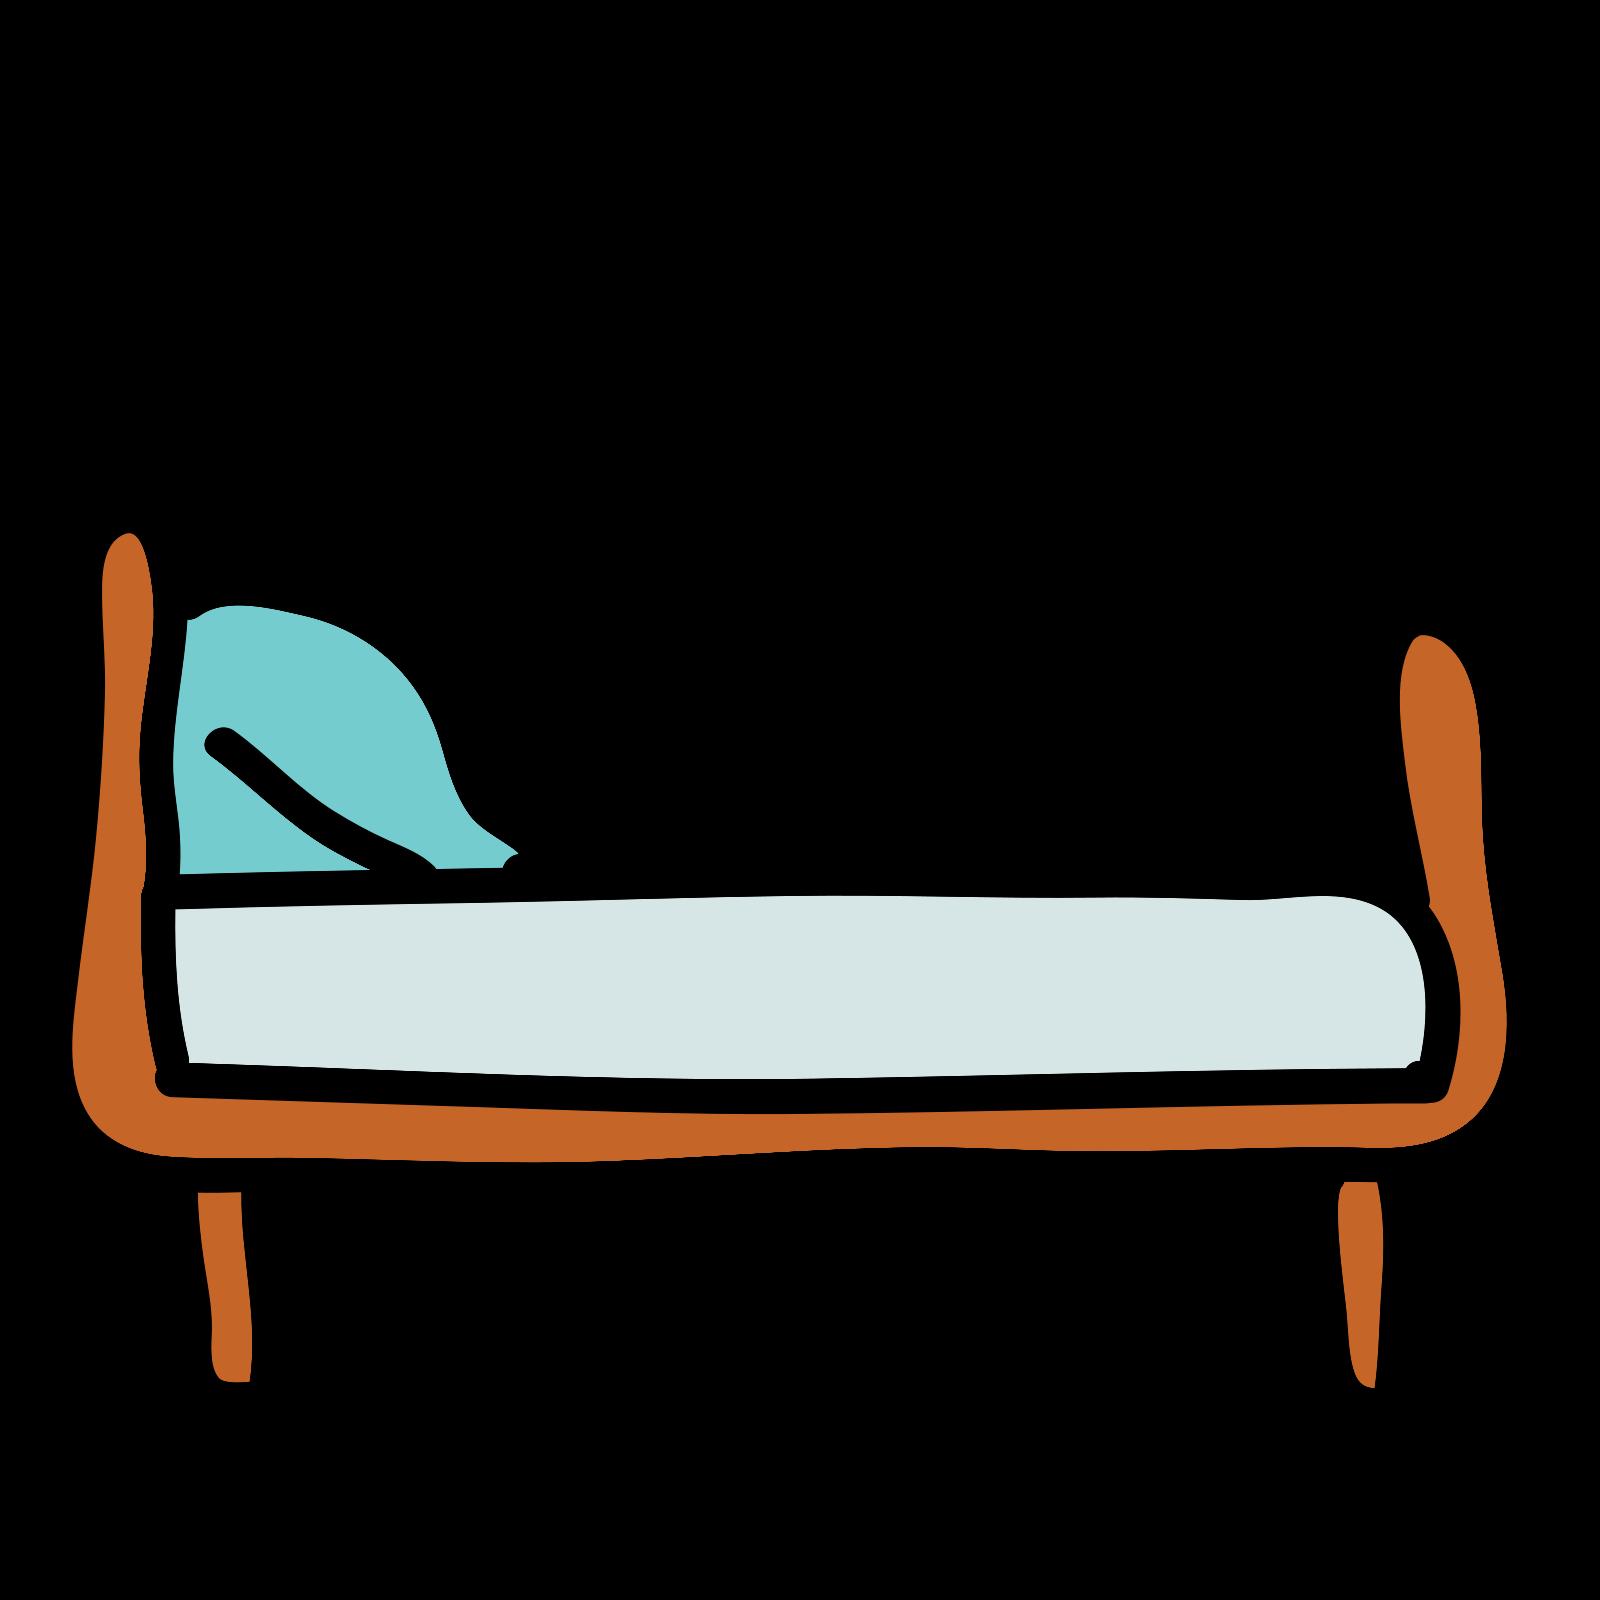 Puste łóżko icon